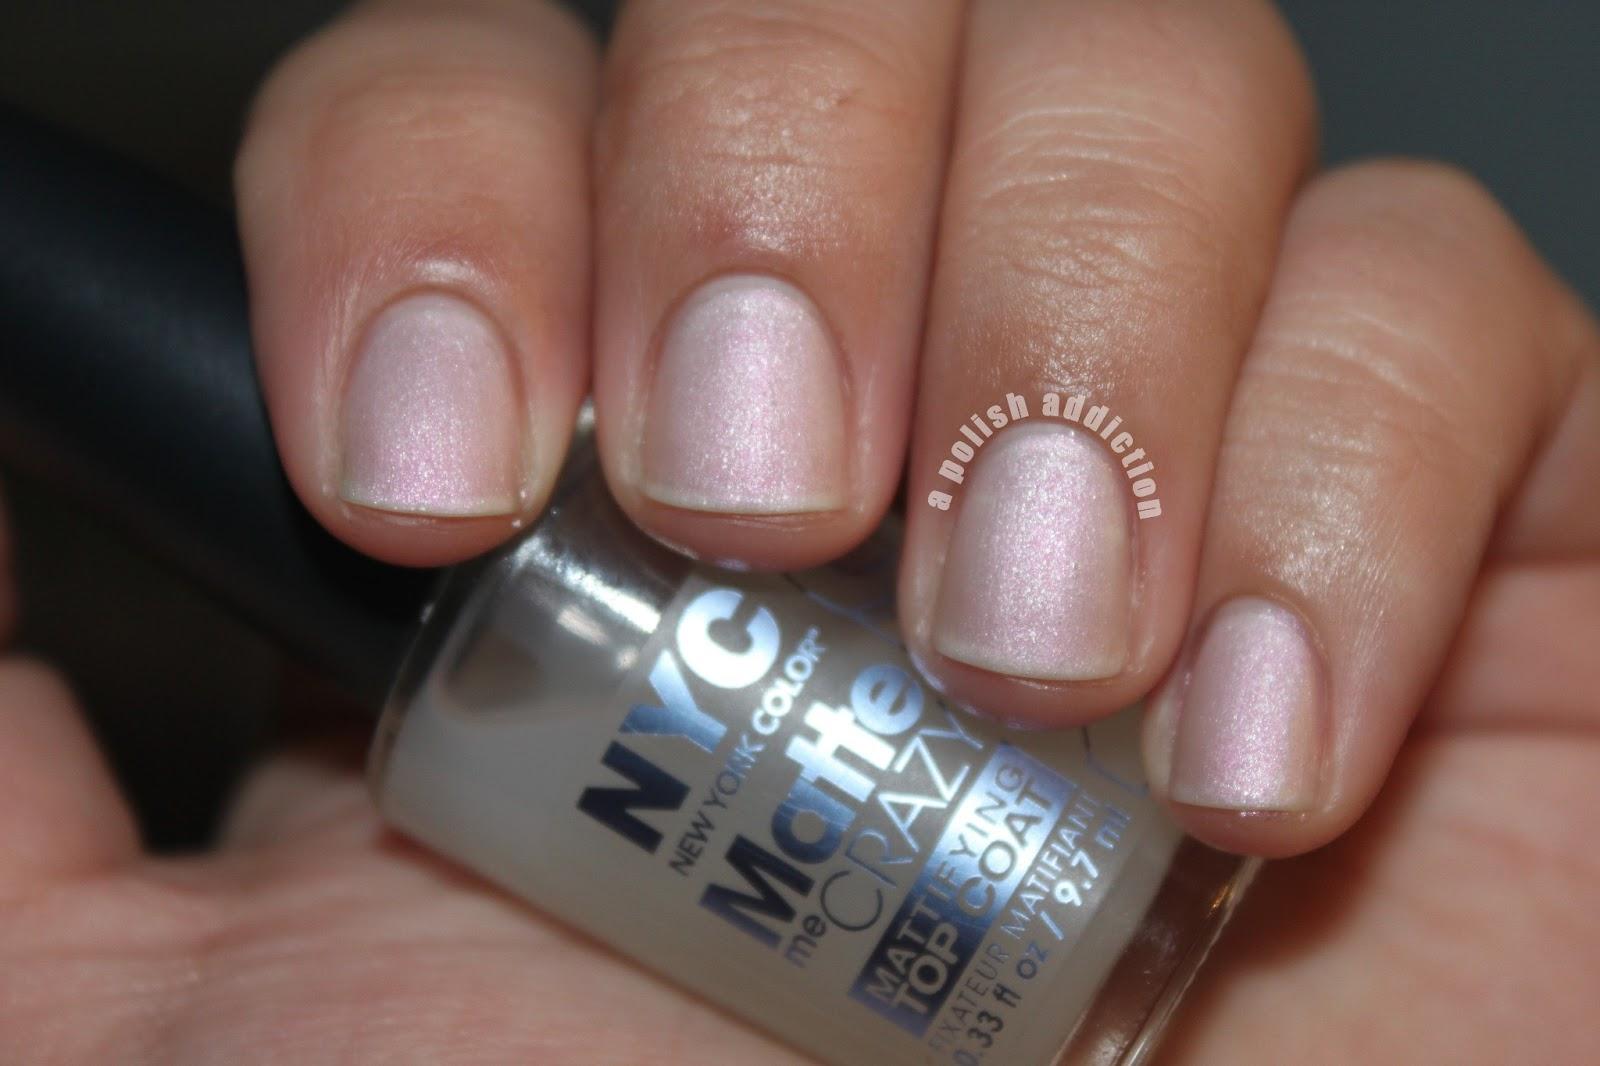 Sally hansen complete salon manicure nail polish angel wings